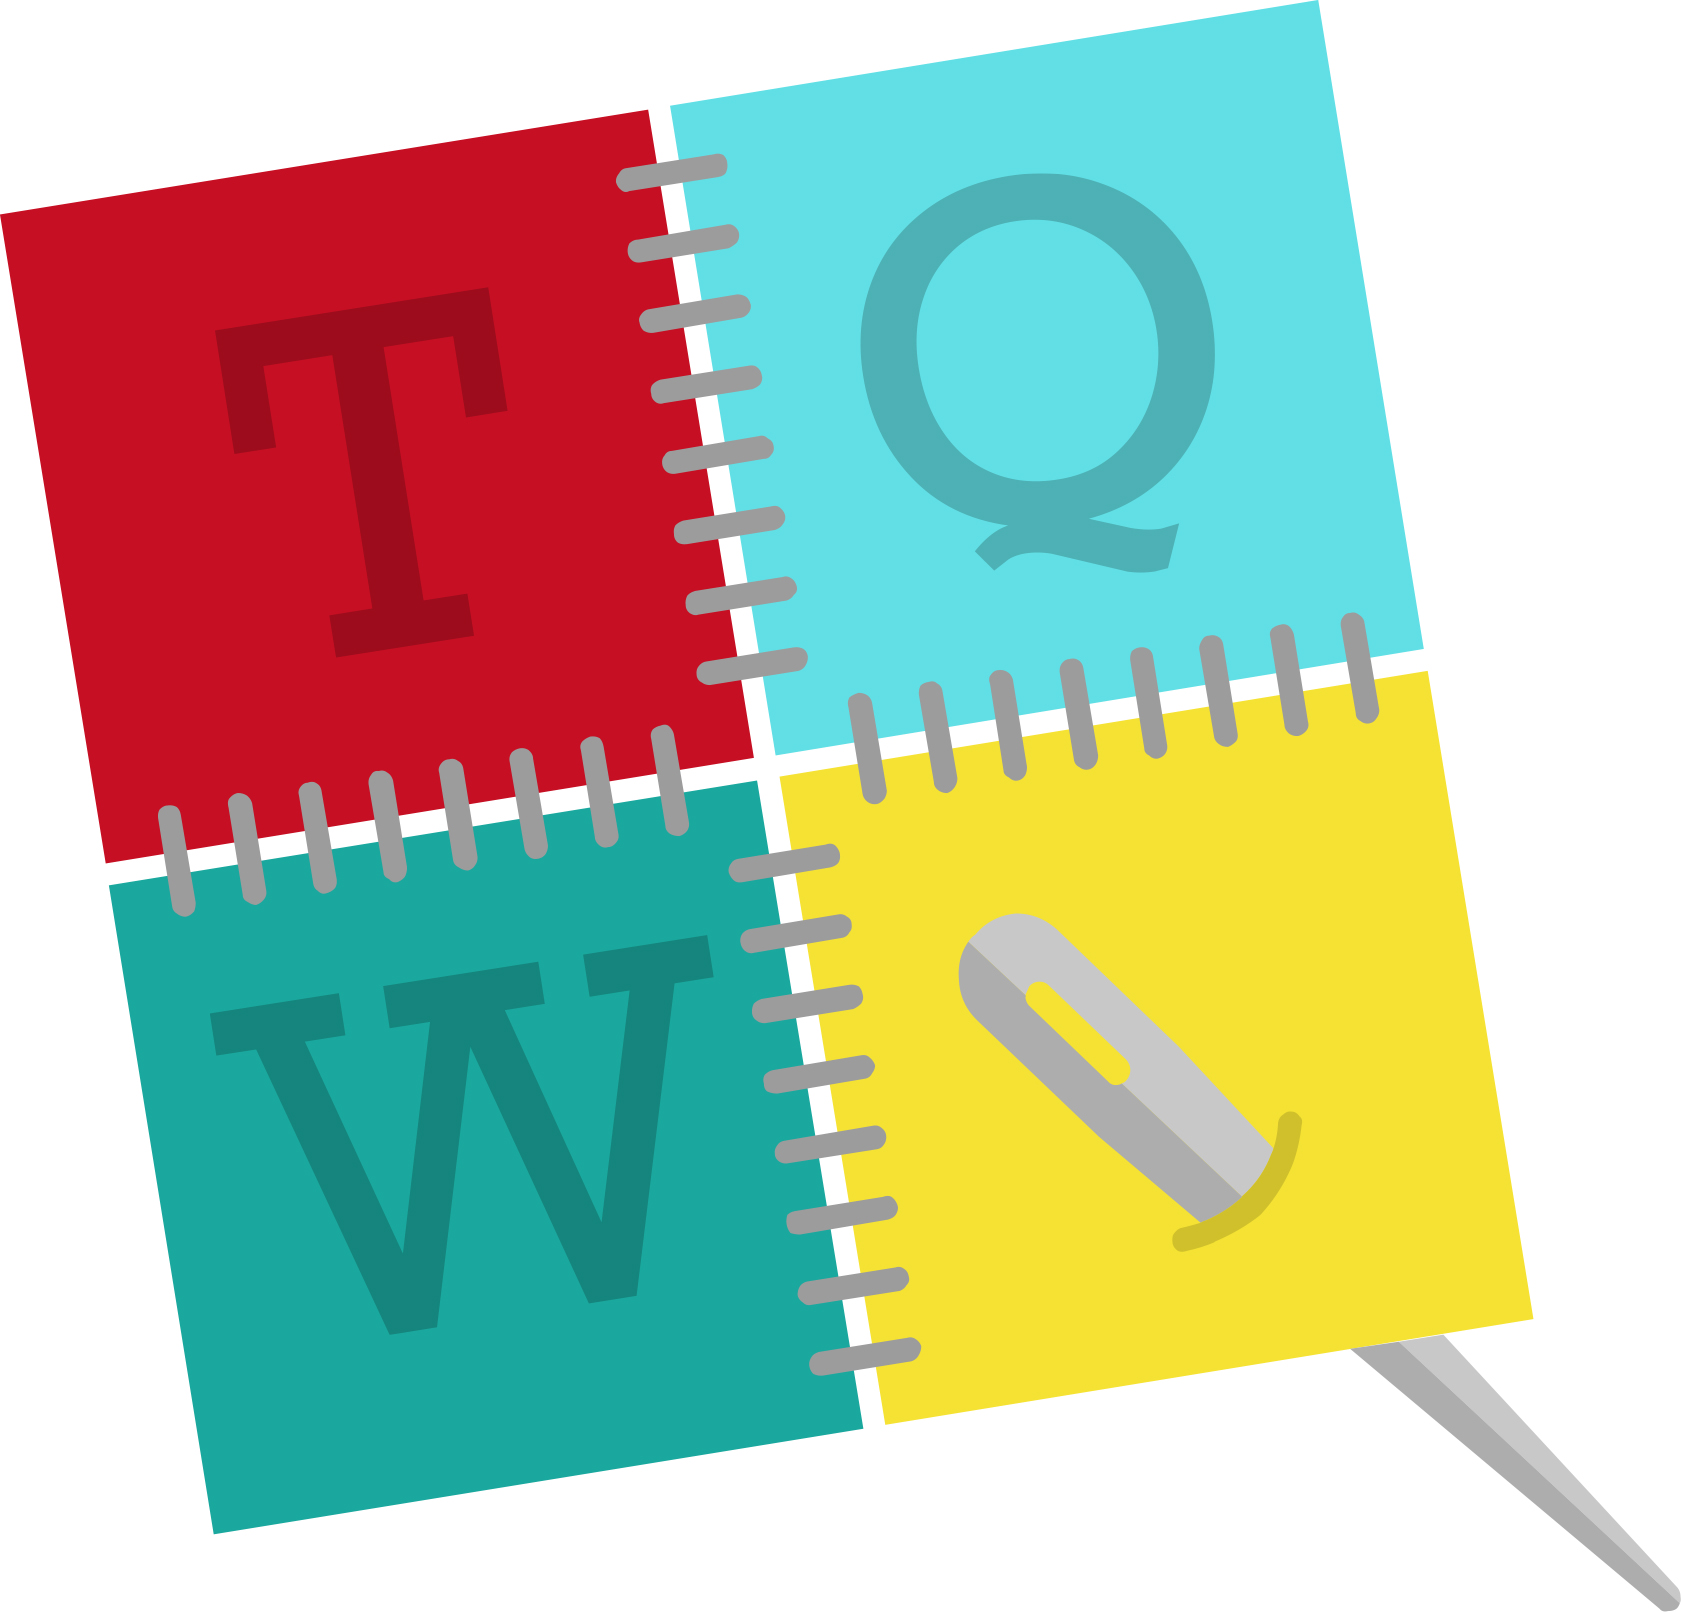 QuiltersWay-logomark-text.jpg